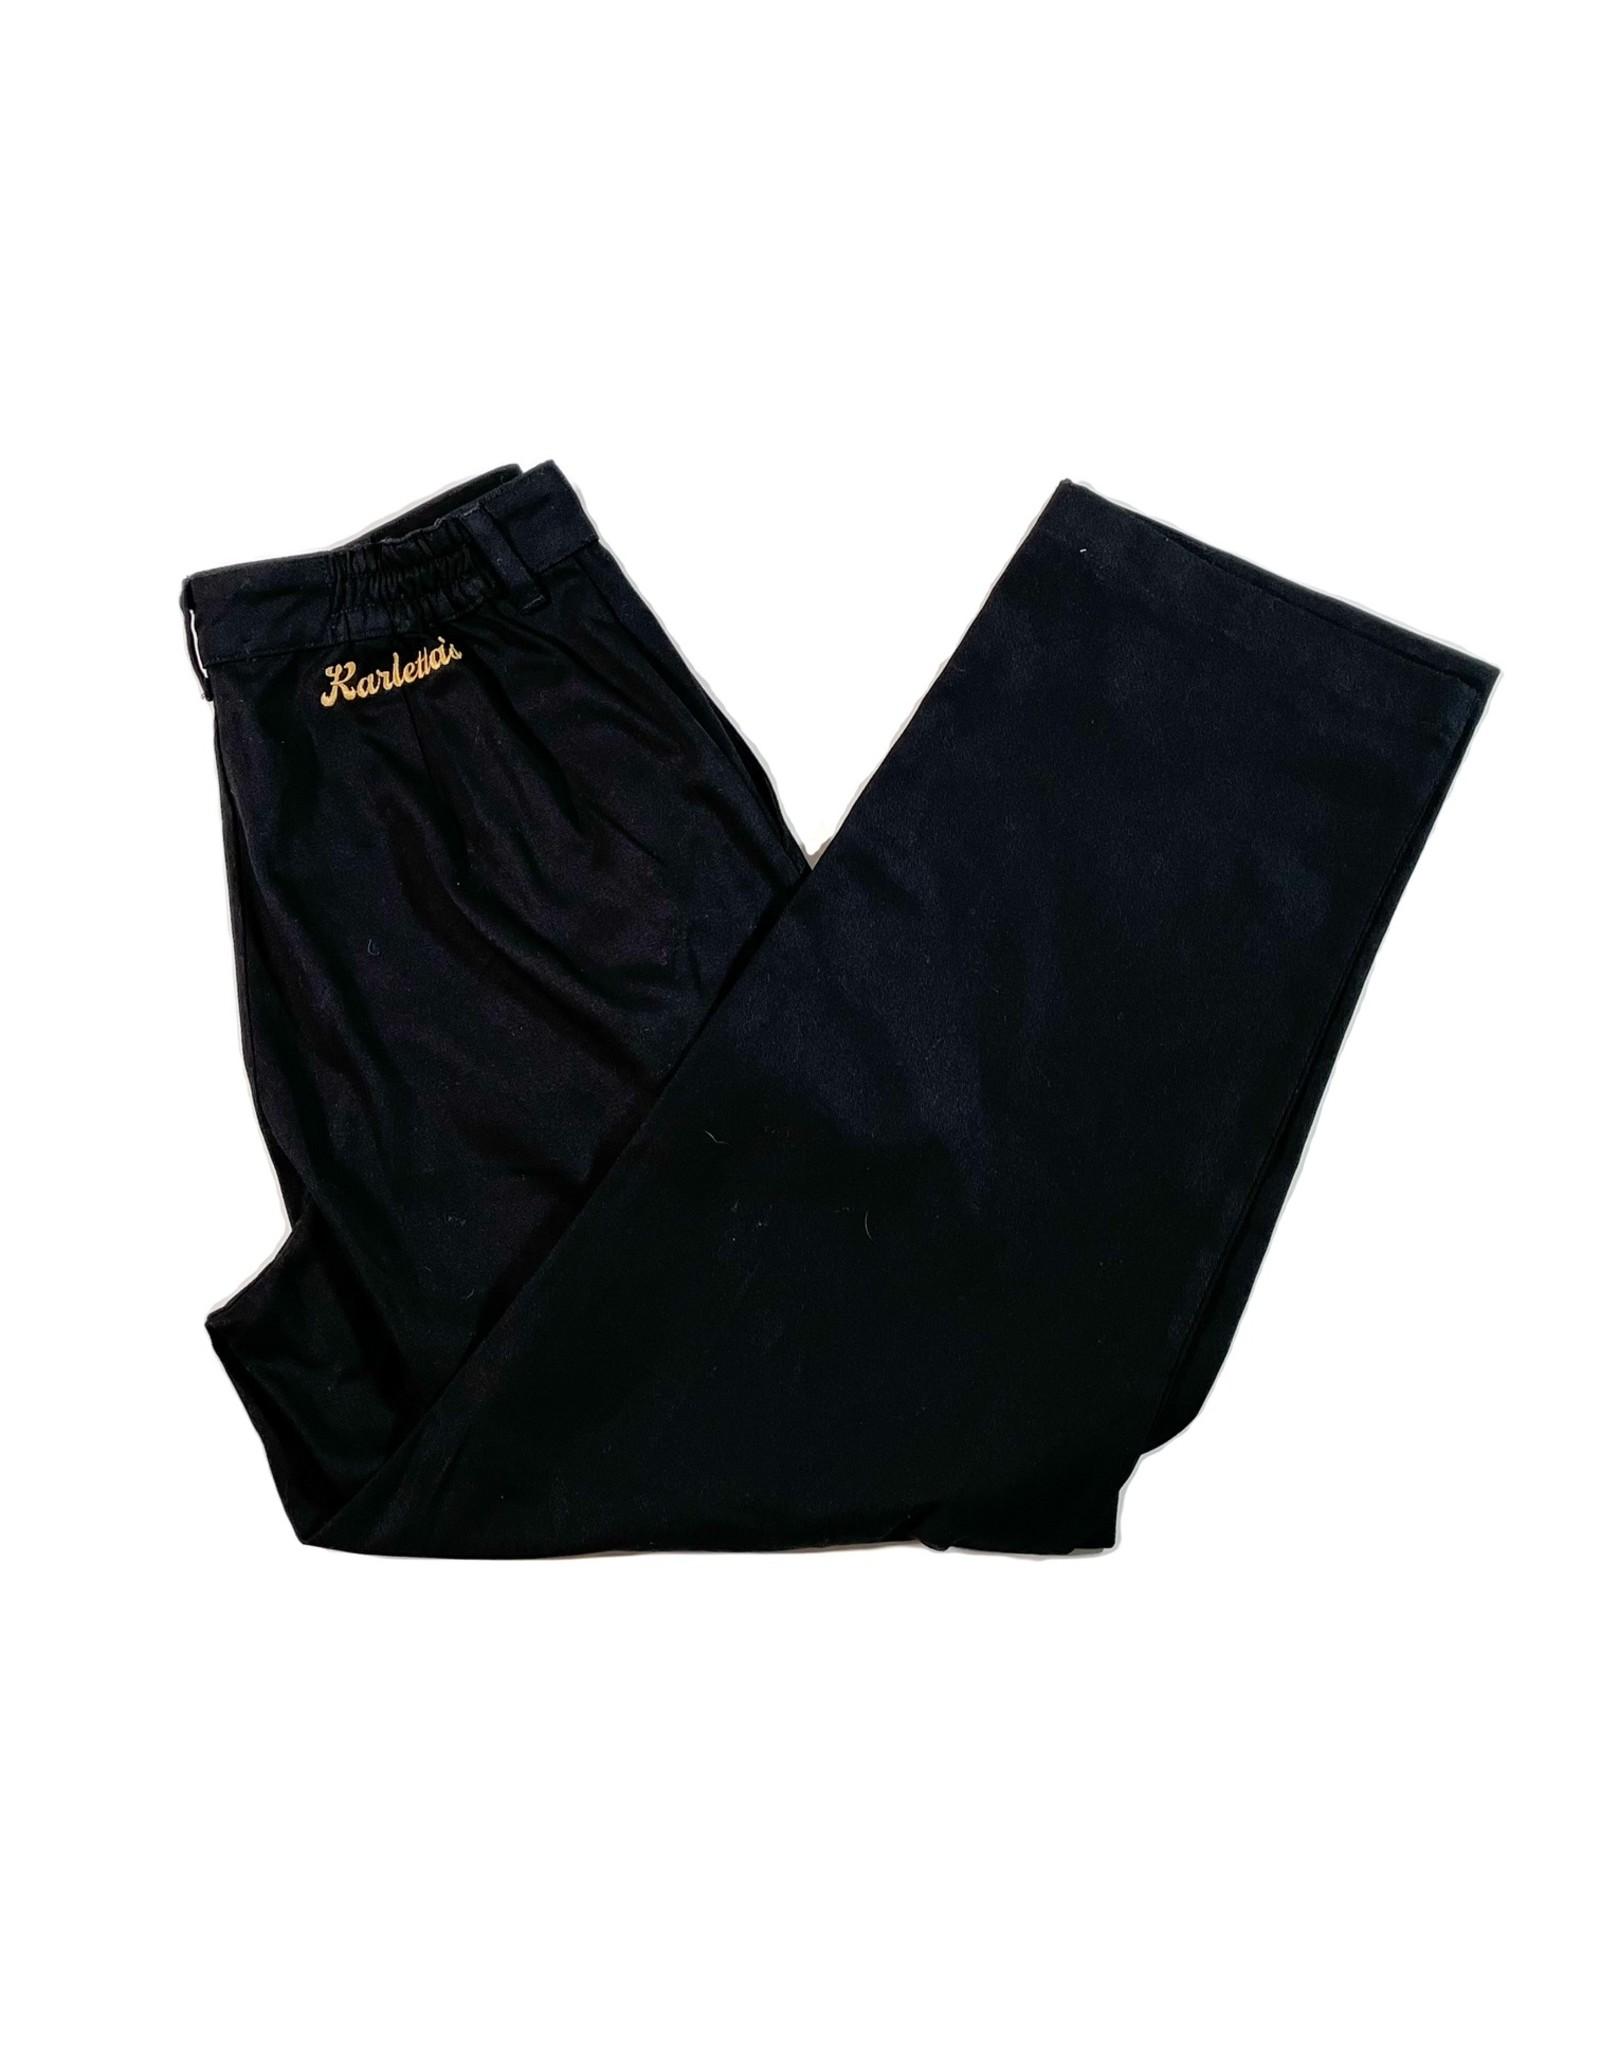 KARLETTA'S KARLETTA'S HIGH RISE PANT - BLACK